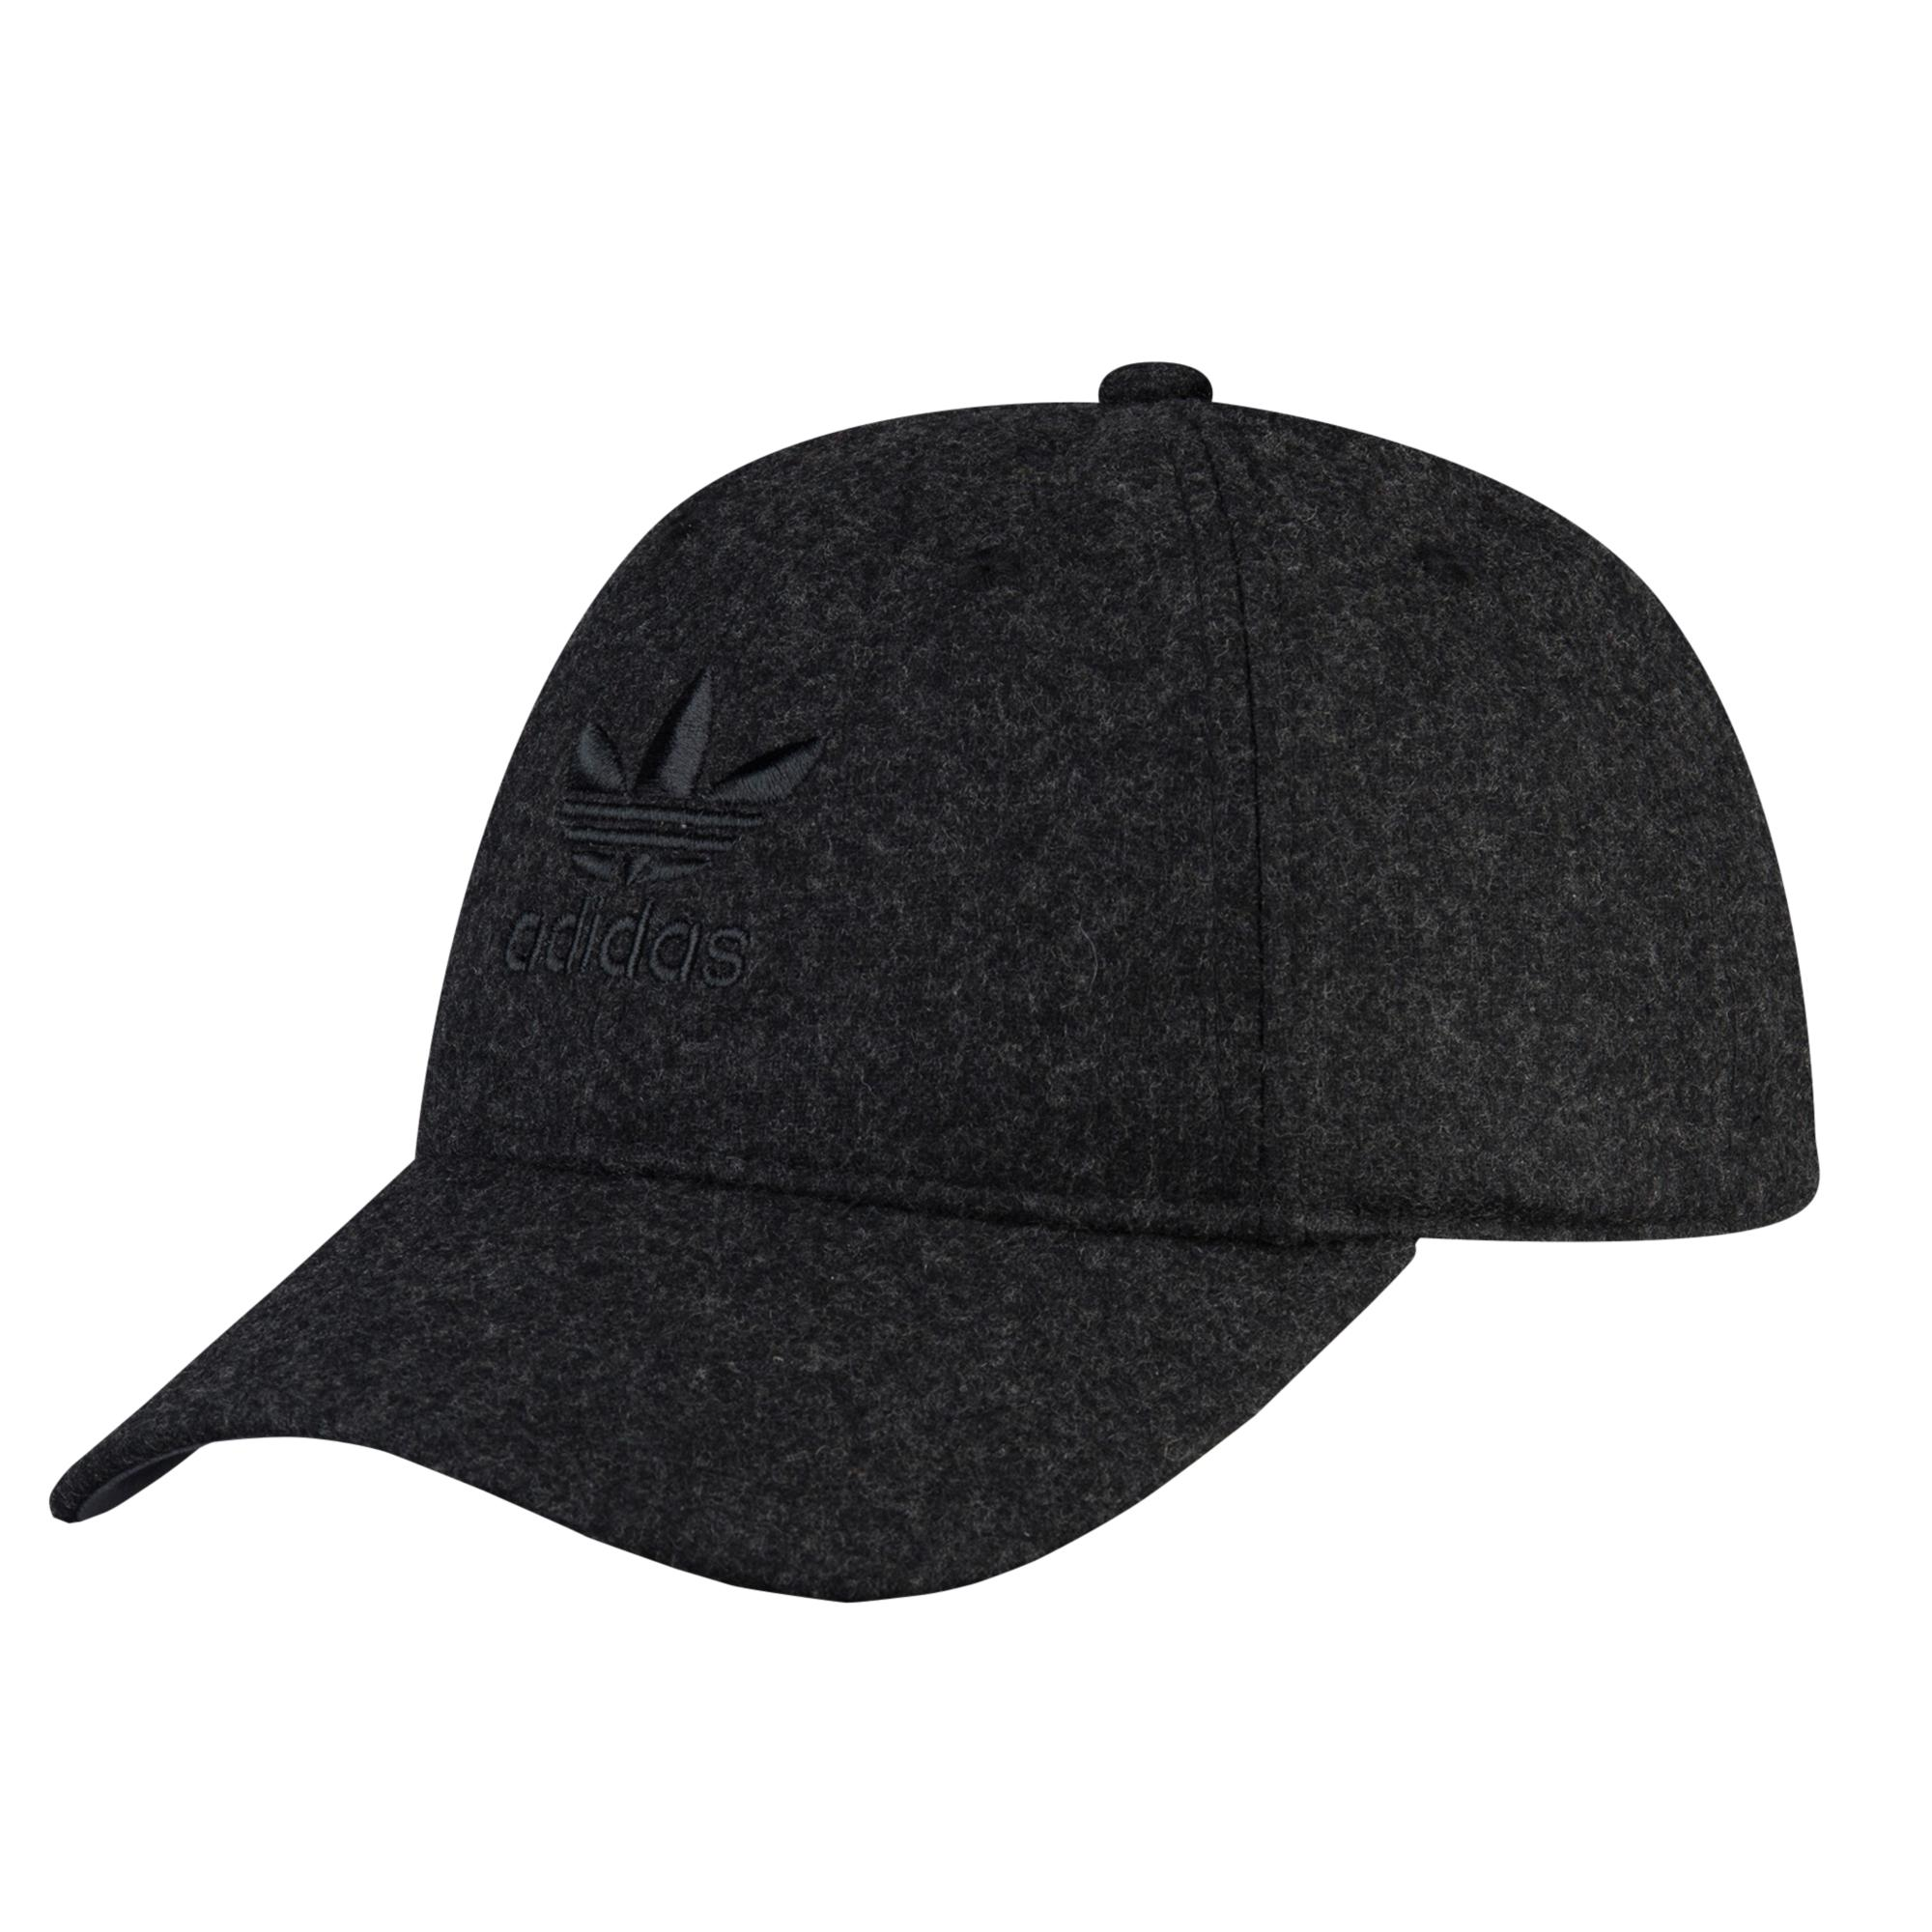 2ca3ceceddf Lyst - Adidas Originals Relaxed Plus Strapback in Black for Men